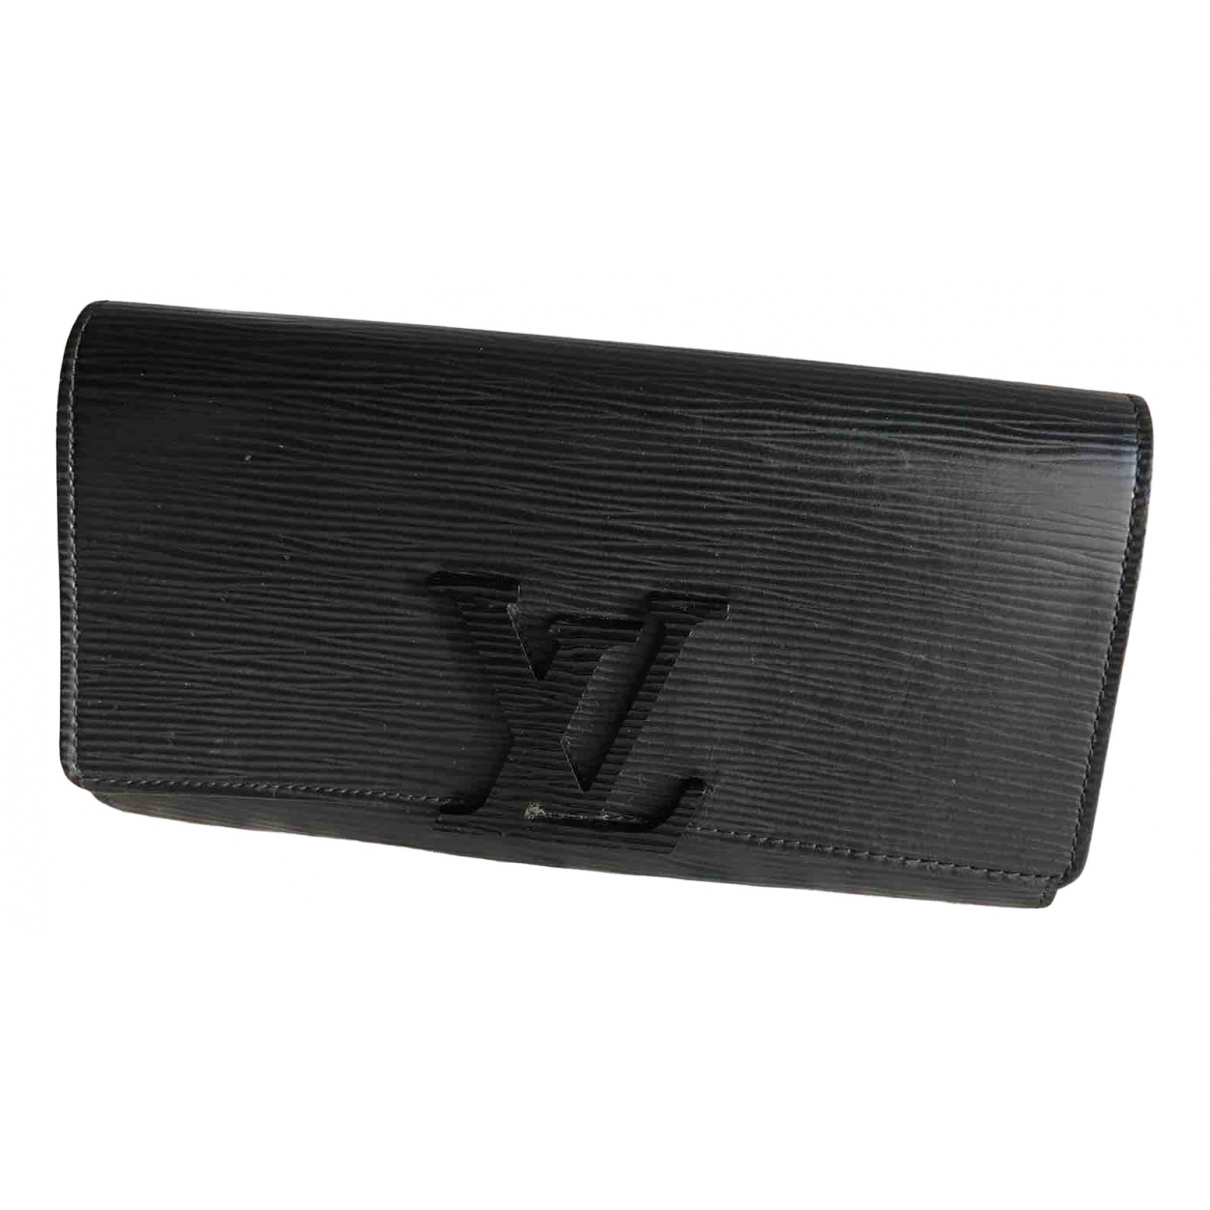 Louis Vuitton Louise Black Leather wallet for Women N